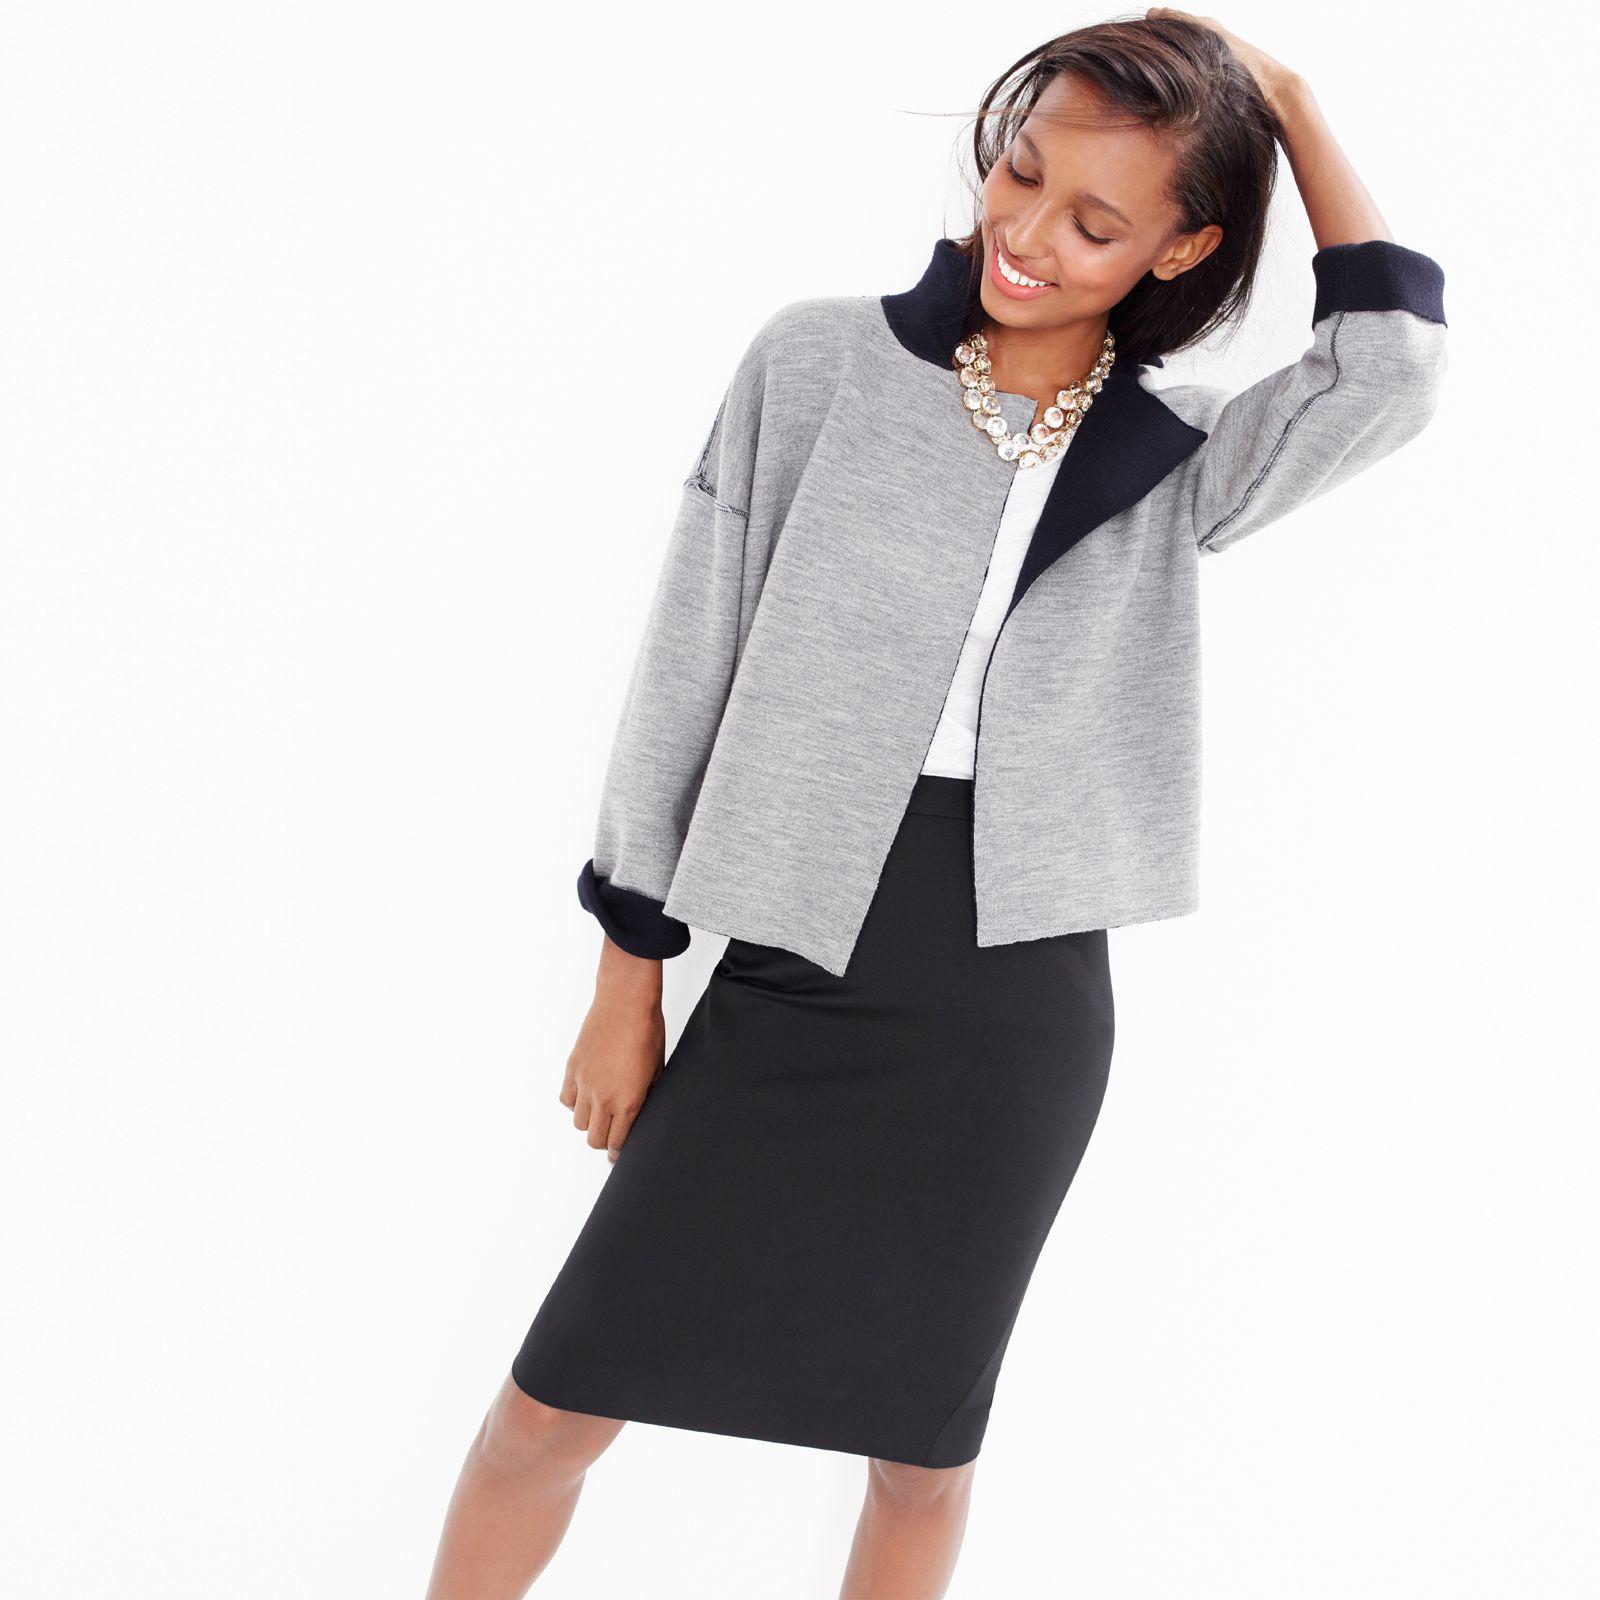 J.Crew Looks We Love: women's reversible sweater-jacket, tissue T-